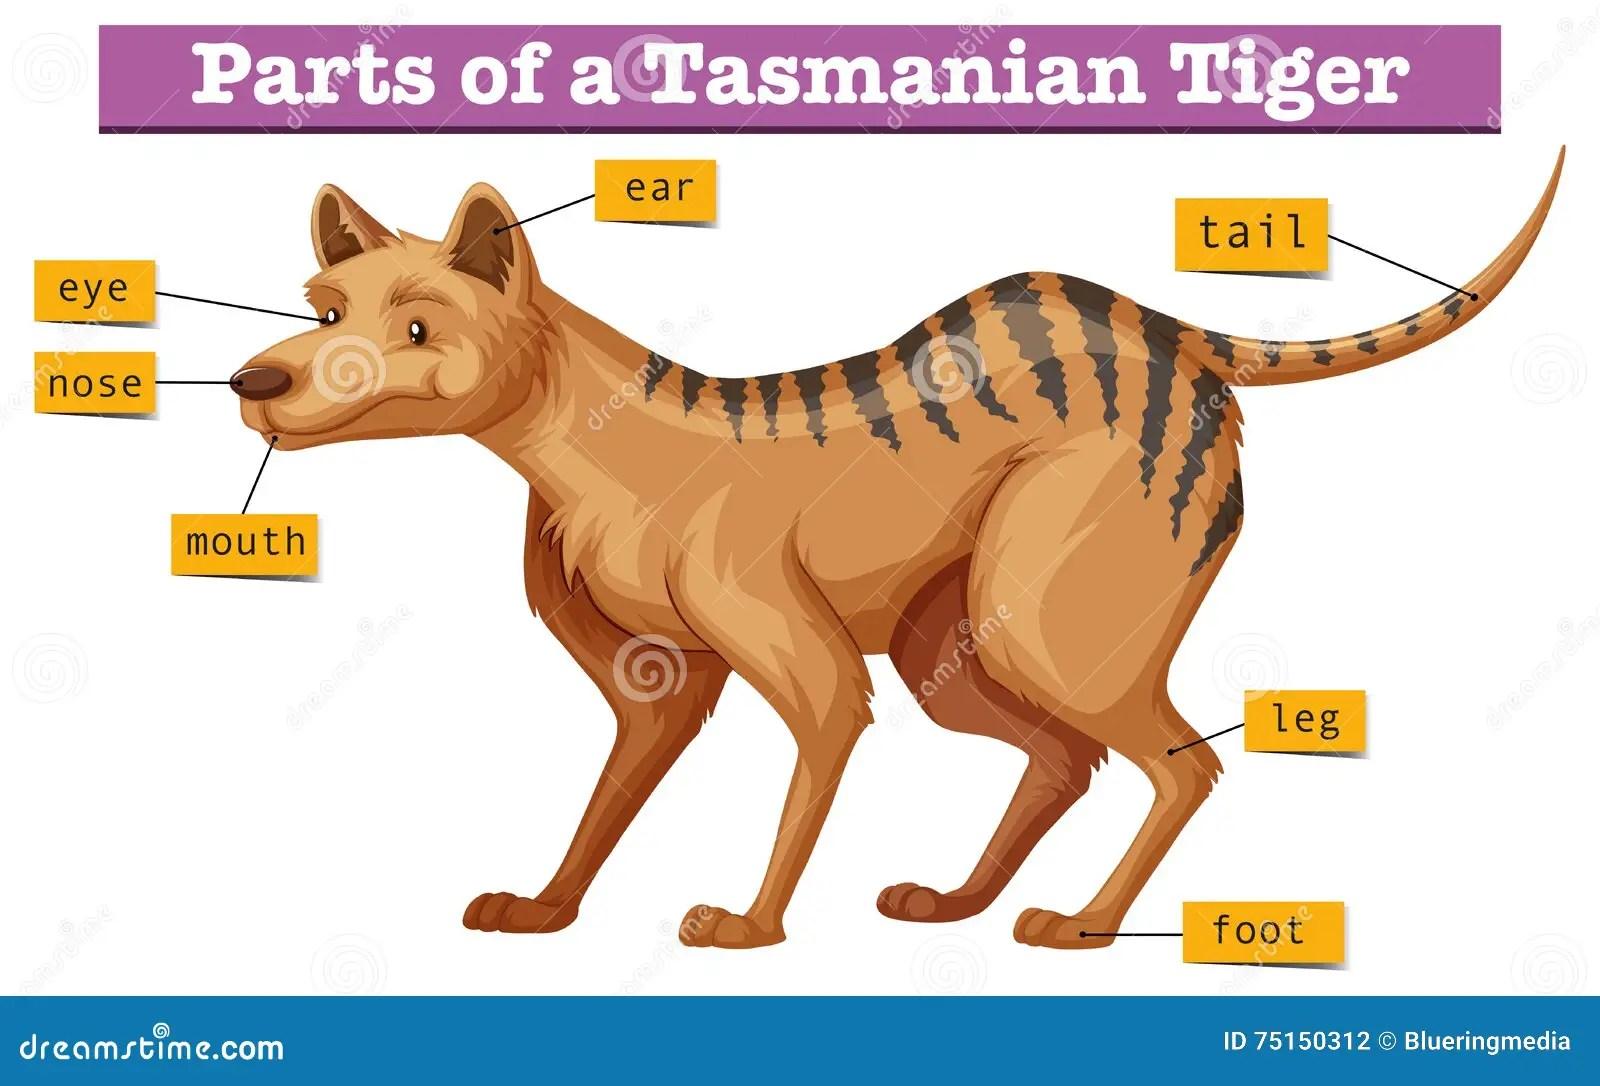 hight resolution of diagram showing parts of tasmanian tiger illustration